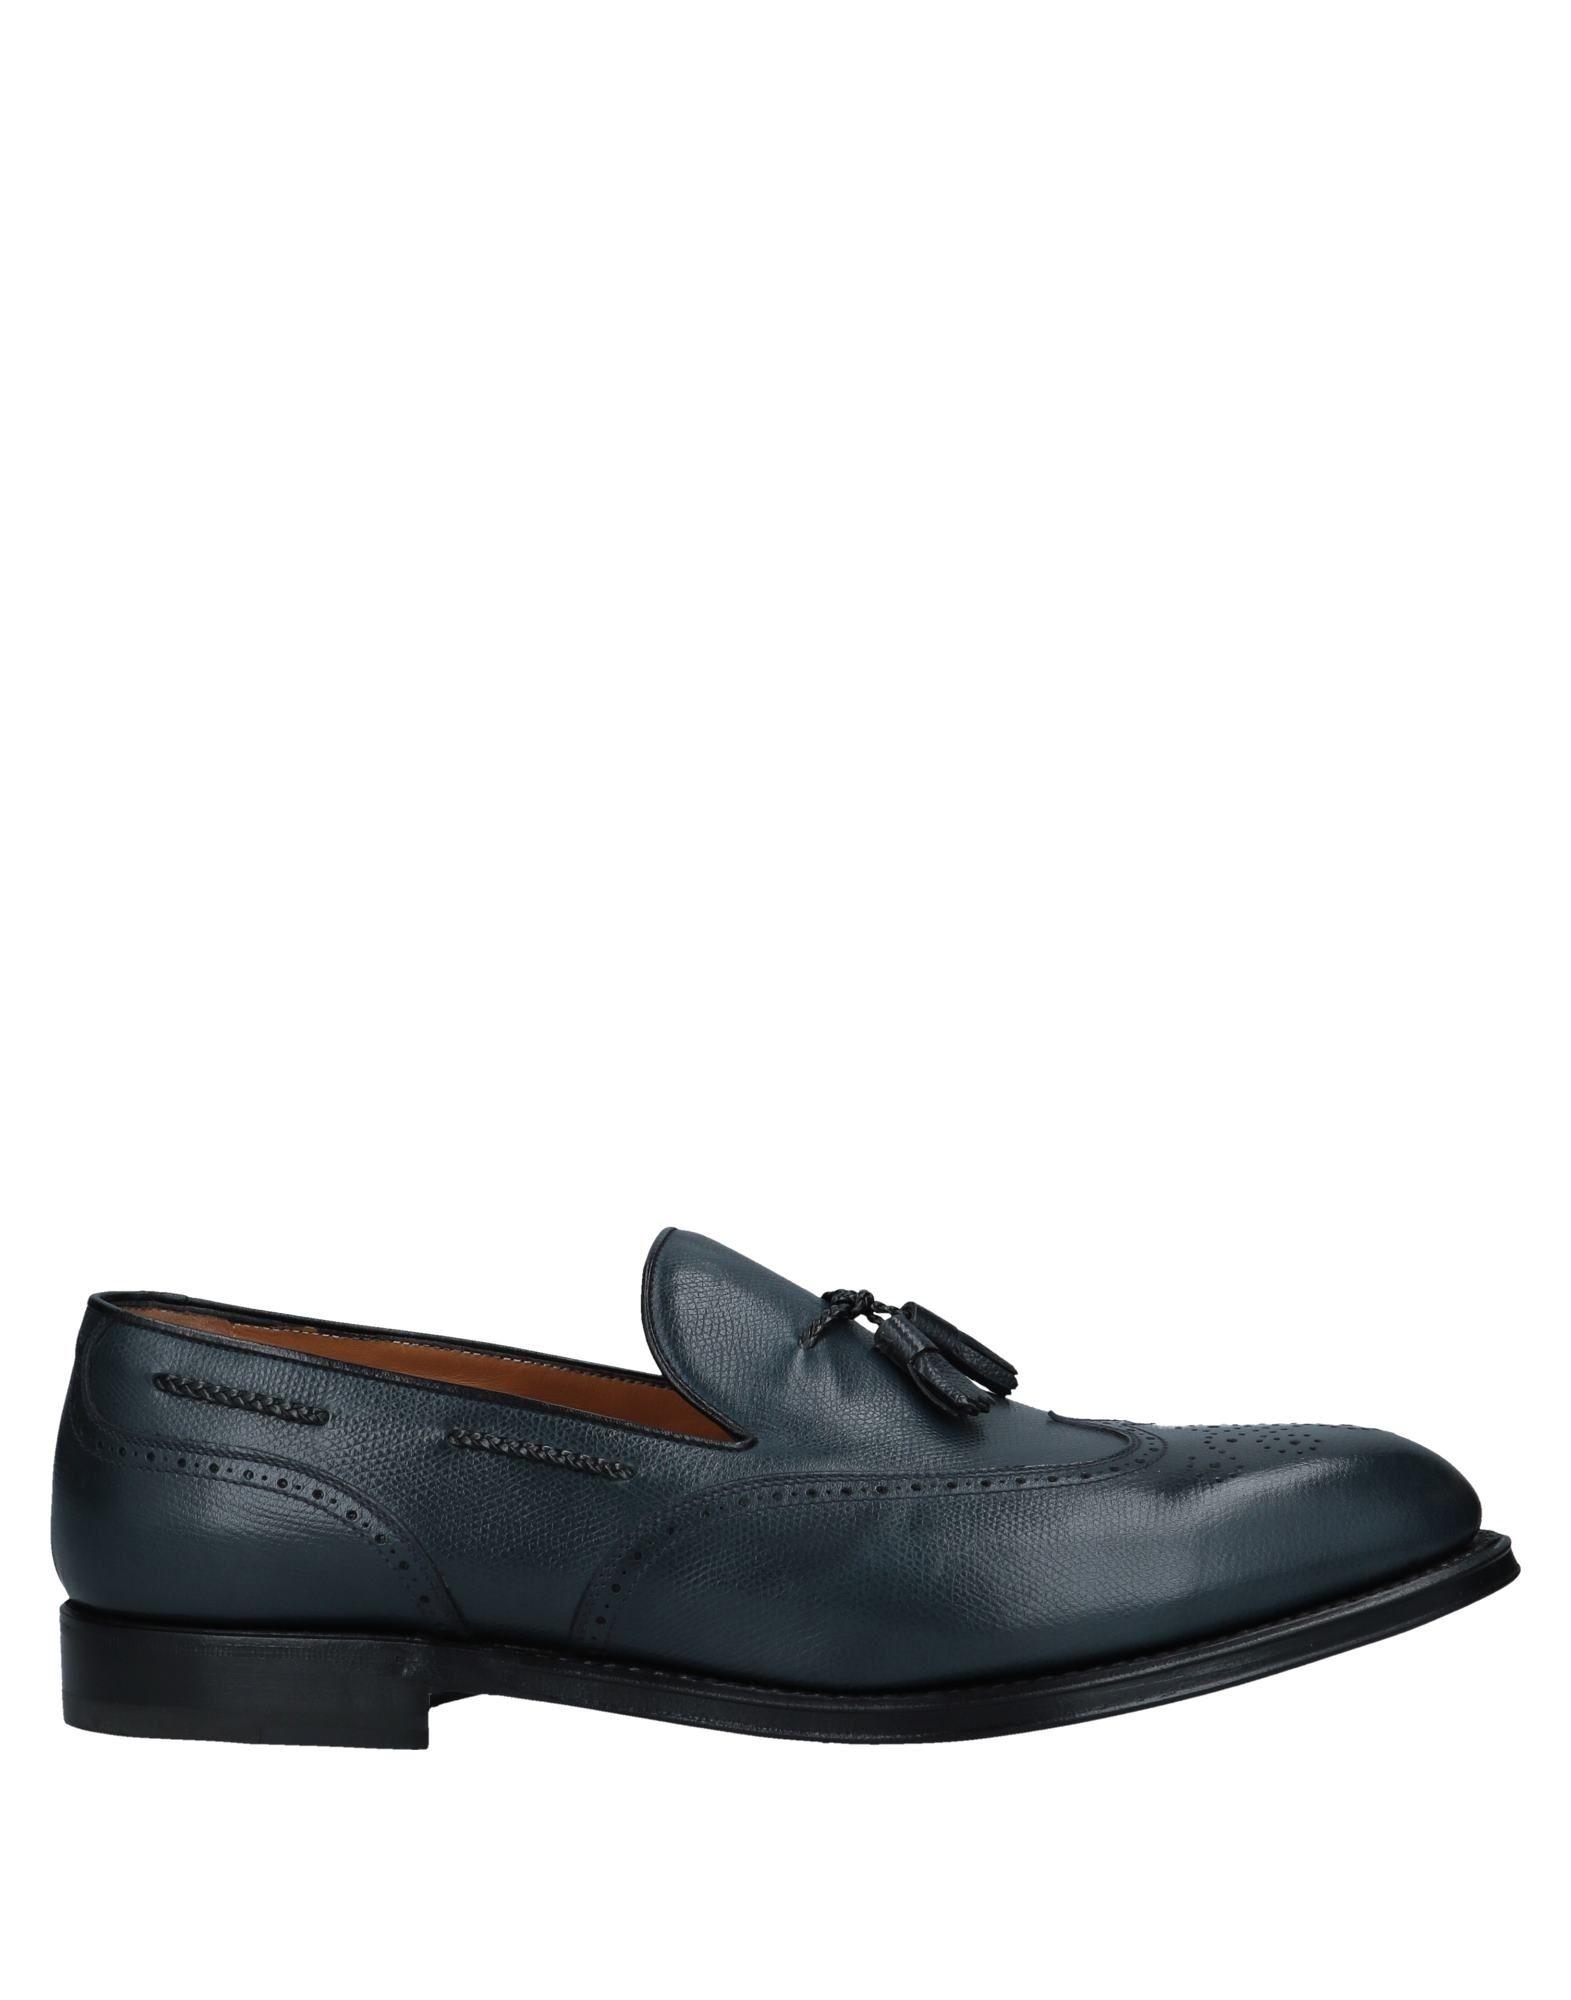 Barrett Mokassins Qualität Herren  11554646PJ Gute Qualität Mokassins beliebte Schuhe f36f7f